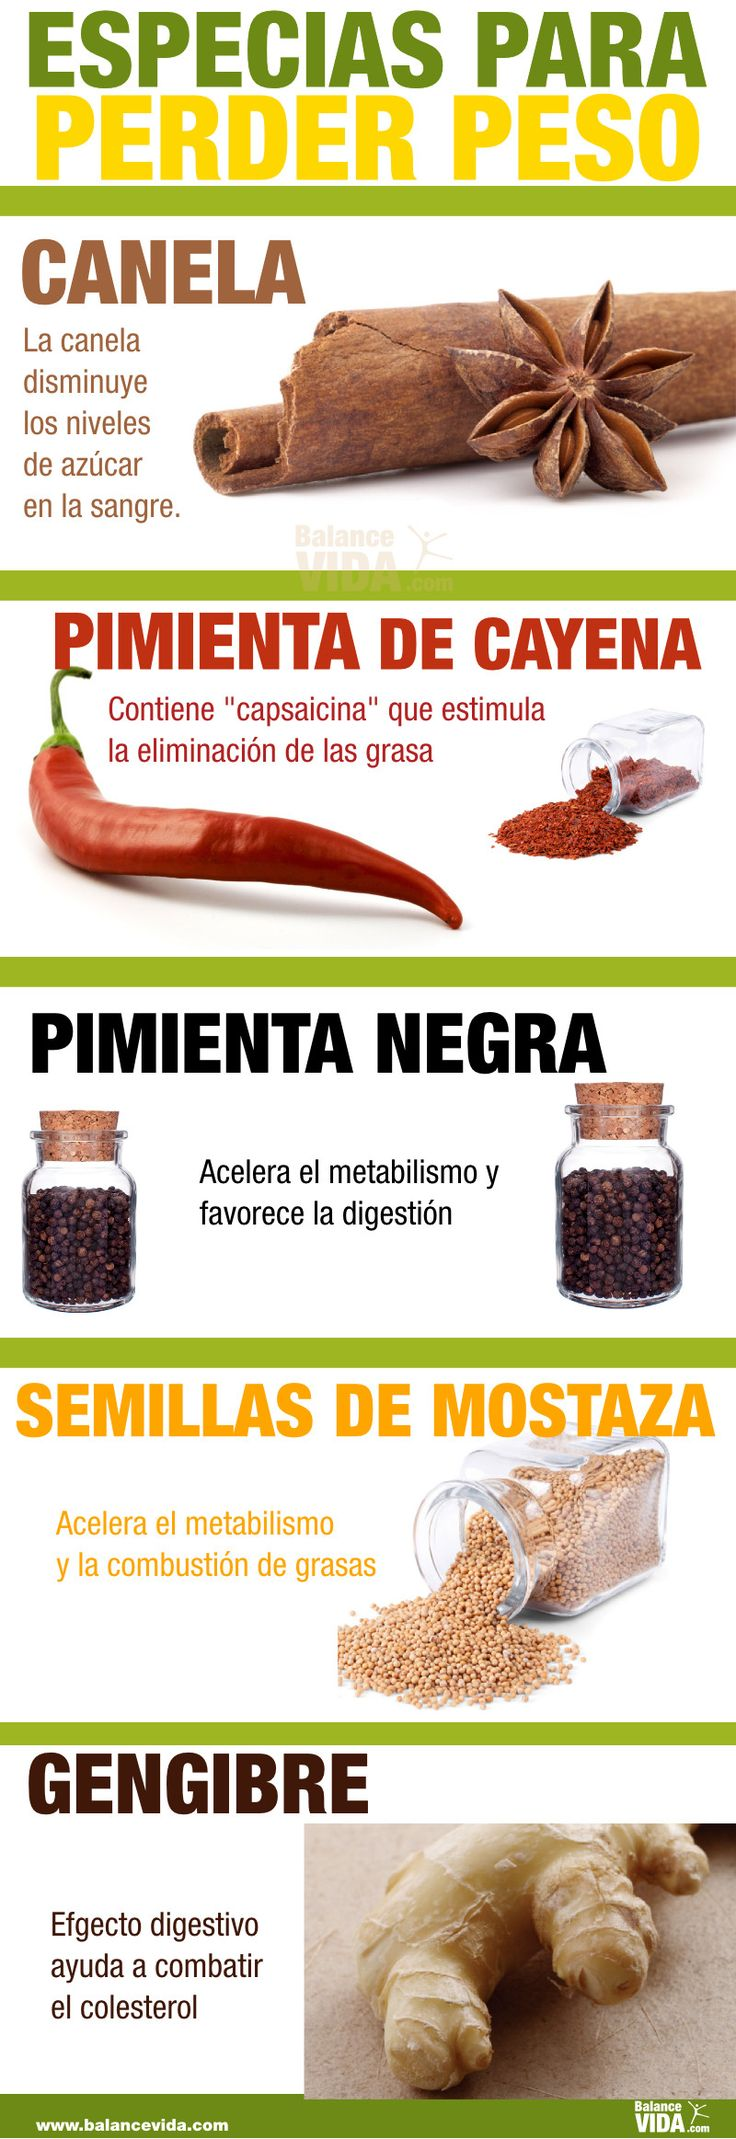 Especias para perder peso